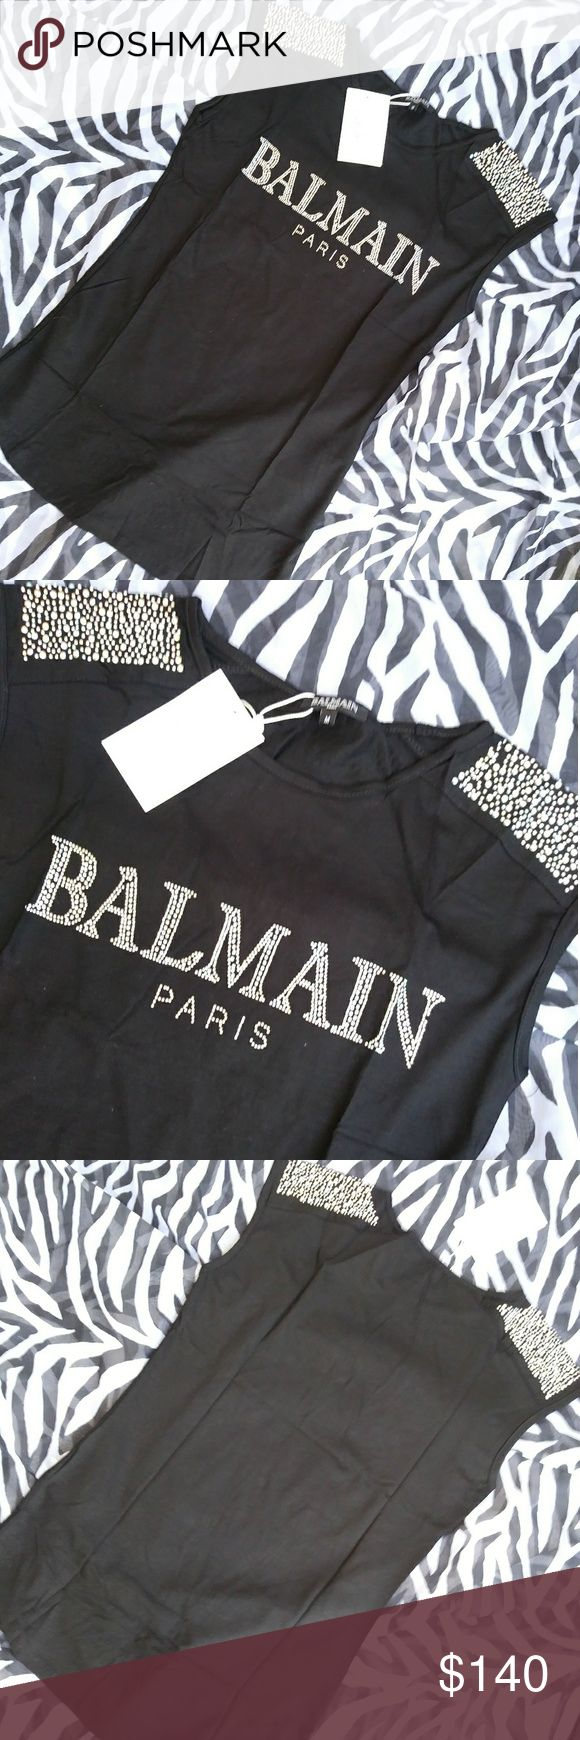 Balmain Iridescent Rhinestone Shirt Brand New with Tags Womens Balmain Studded Rhinestone Top Balmain Tops Tank Tops